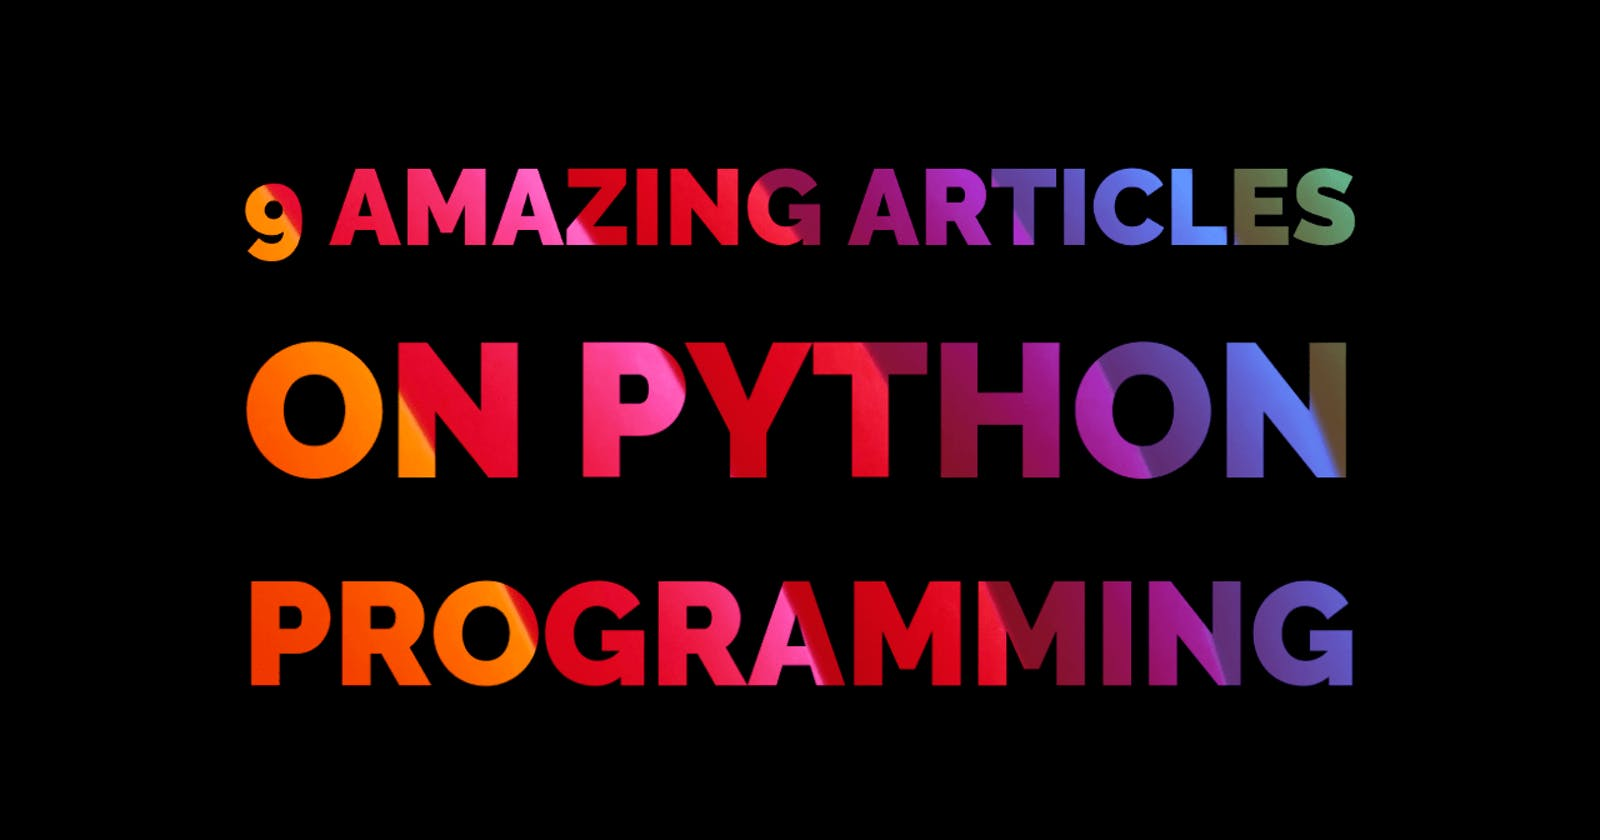 9 Amazing Articles on Python Programming